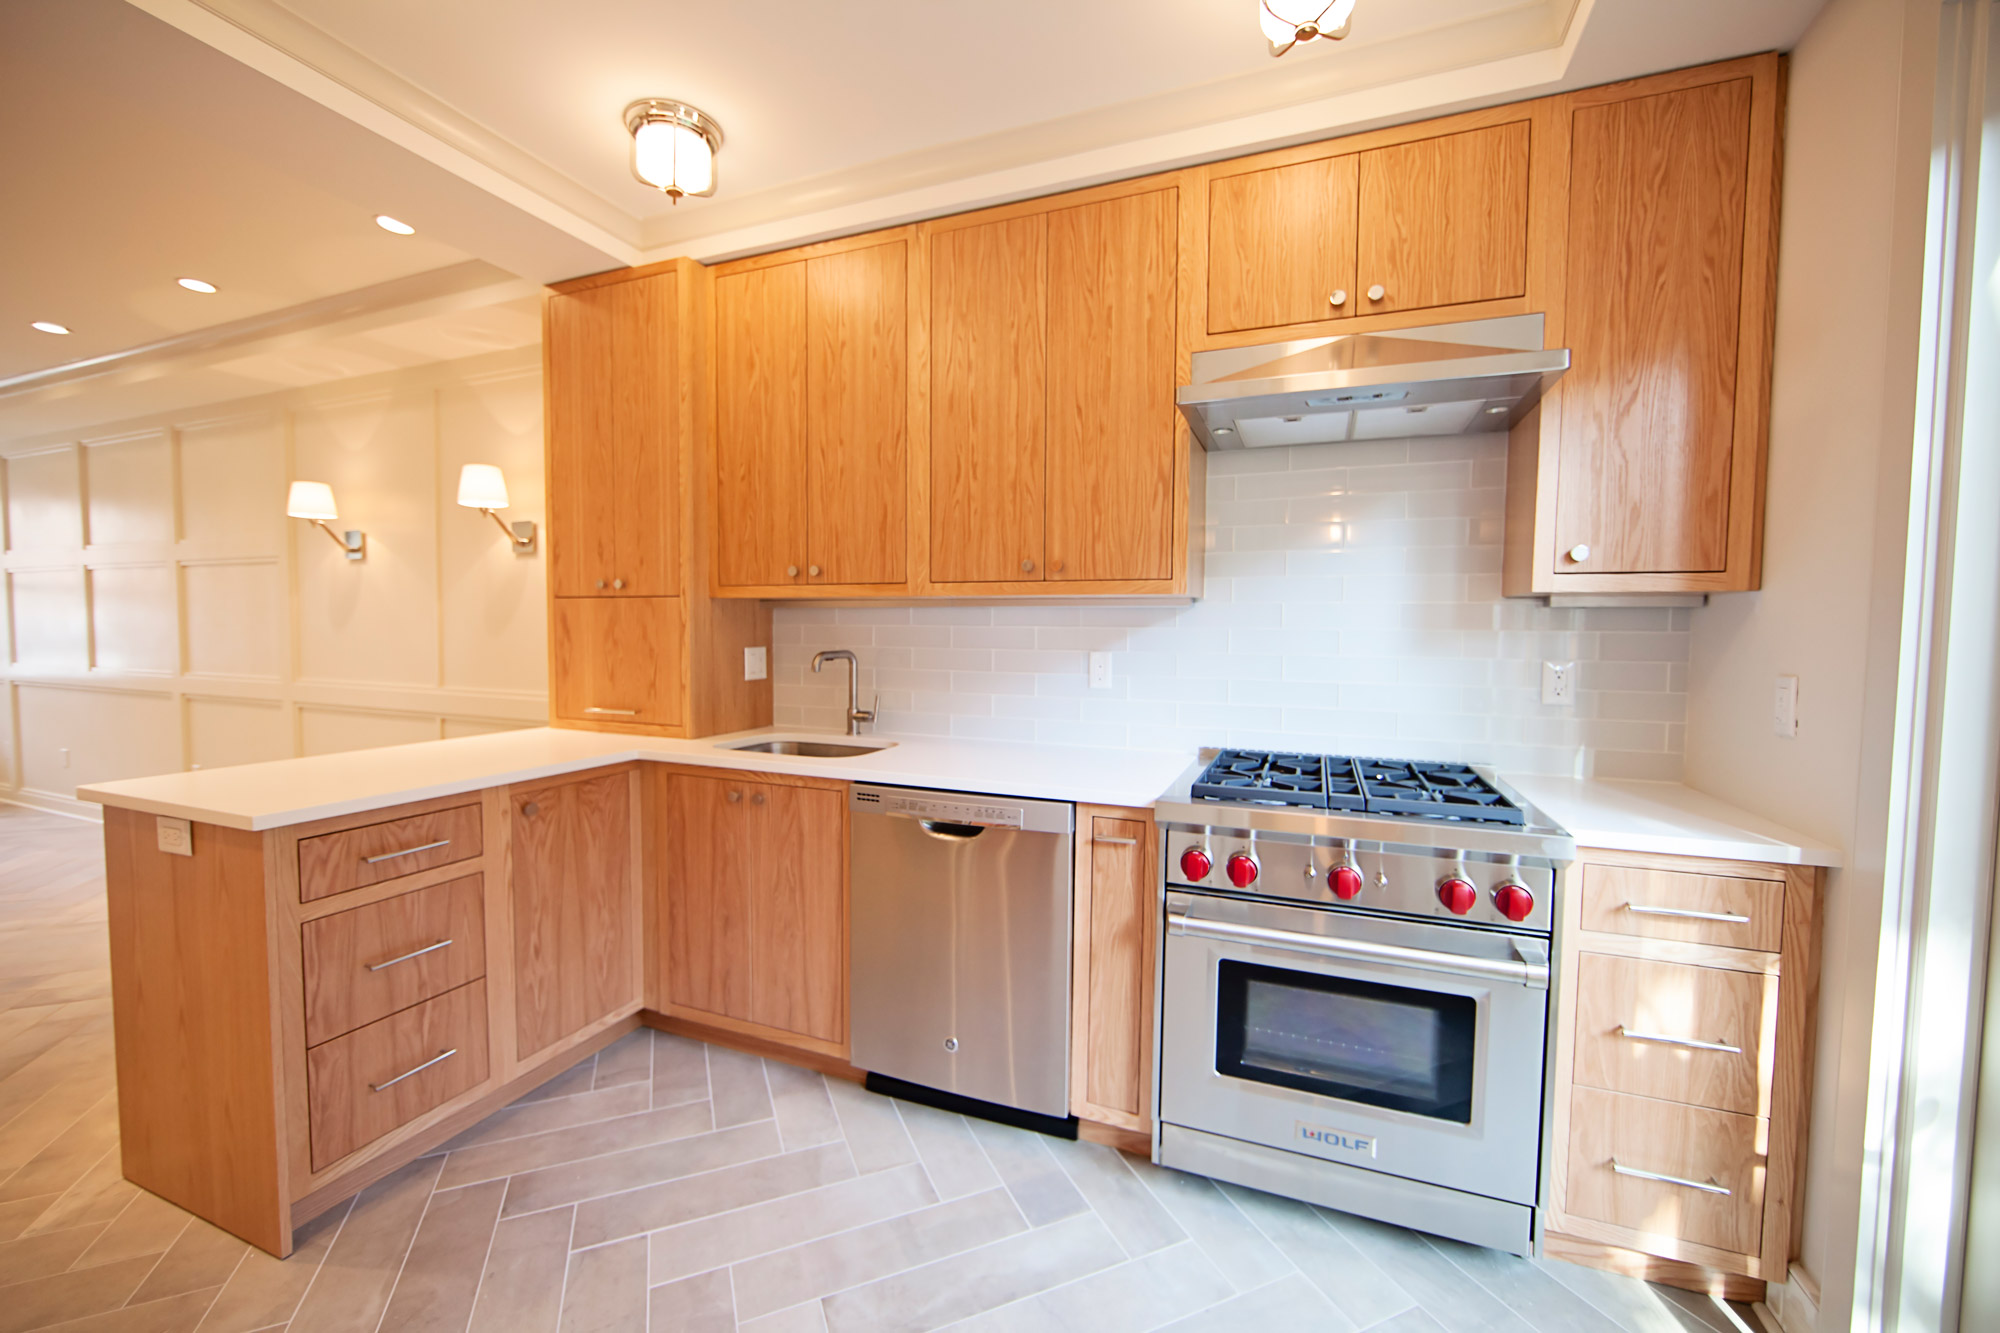 thompson-fine-home-renovations-hoboken-new-jersey-construction-5.jpg